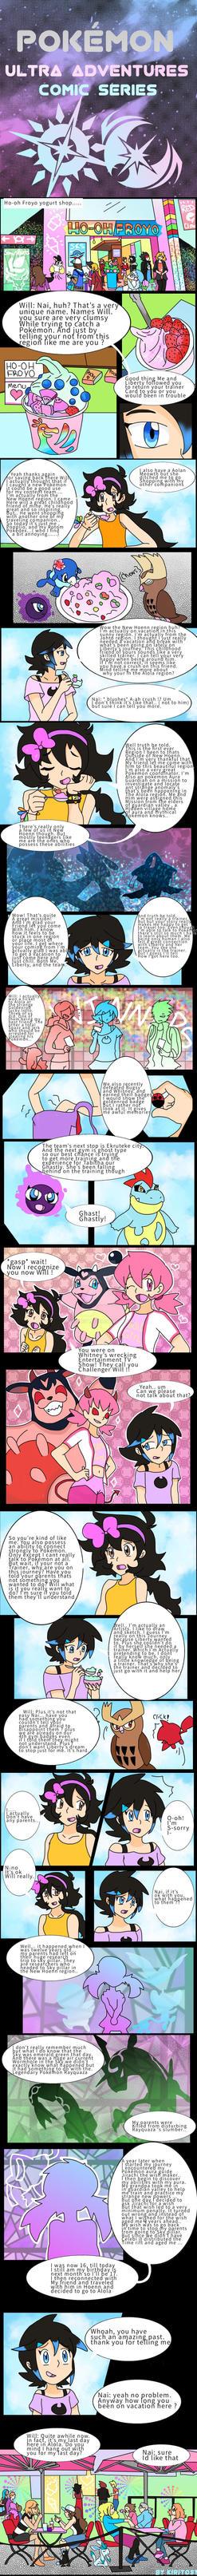 Pokemon Ultra Adventures Comic Chapter2 Pg.22